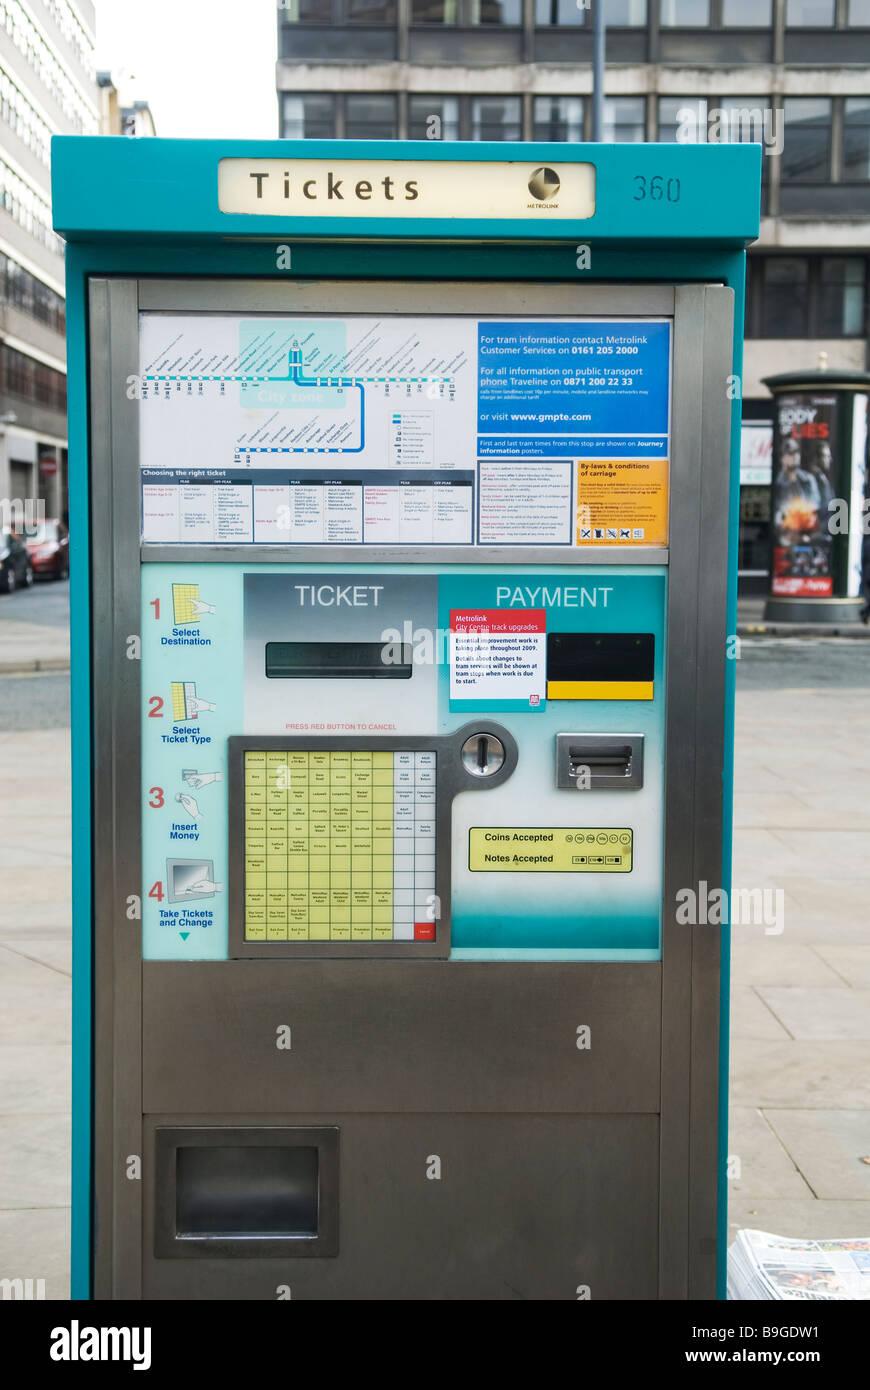 Metrolink tram ticket vending machine Manchester city centre UK - Stock Image